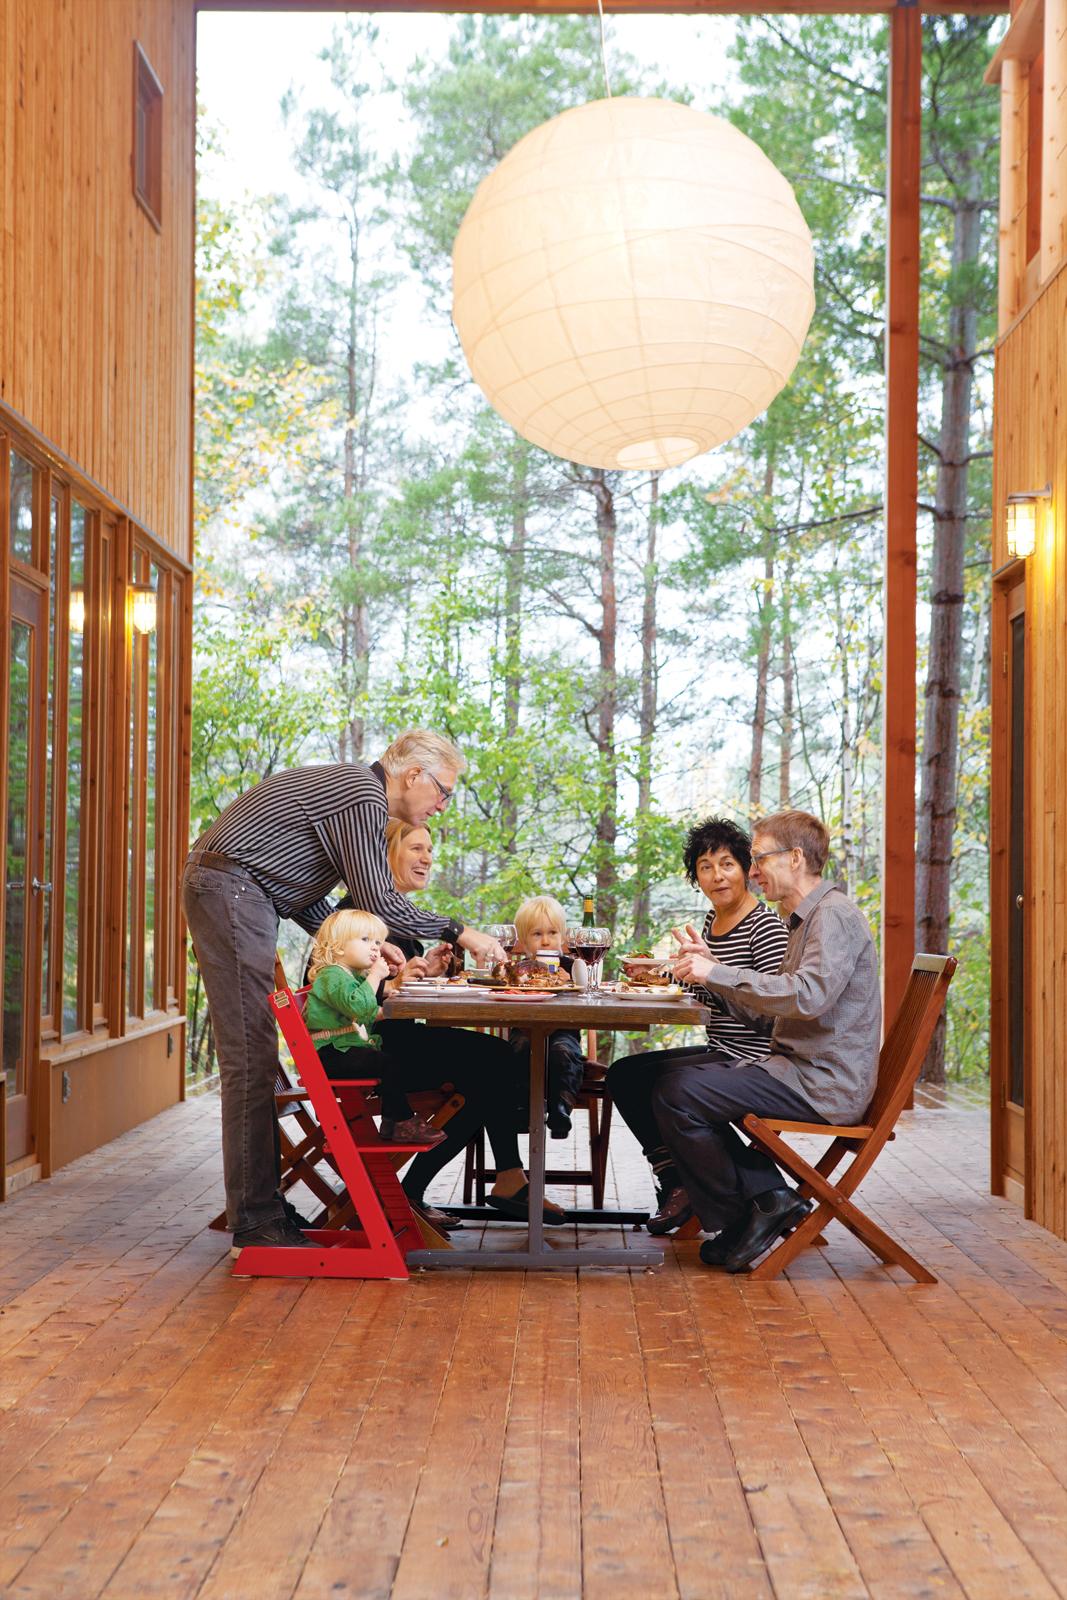 Outdoor wooden activity porch